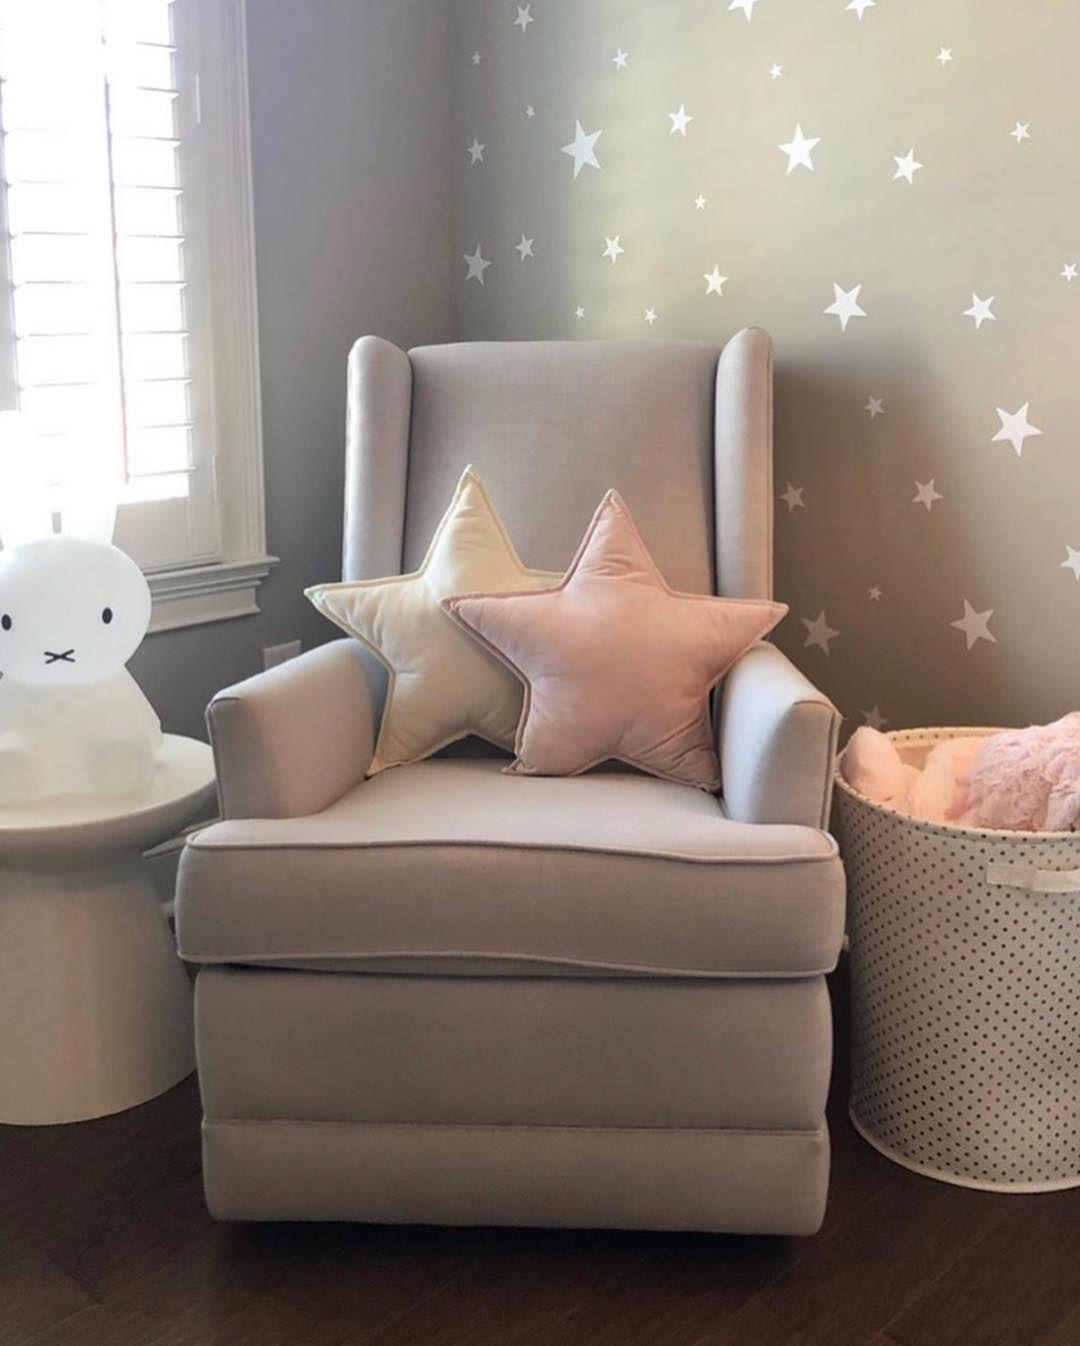 Fascinating 23 Best Interior Design Resources Top 5 Interior Design Companies In Dubai Samt Retrostyle Homedecorlover Rustic Bedroom Furniture Home Decor Cheap Bedroom Furniture